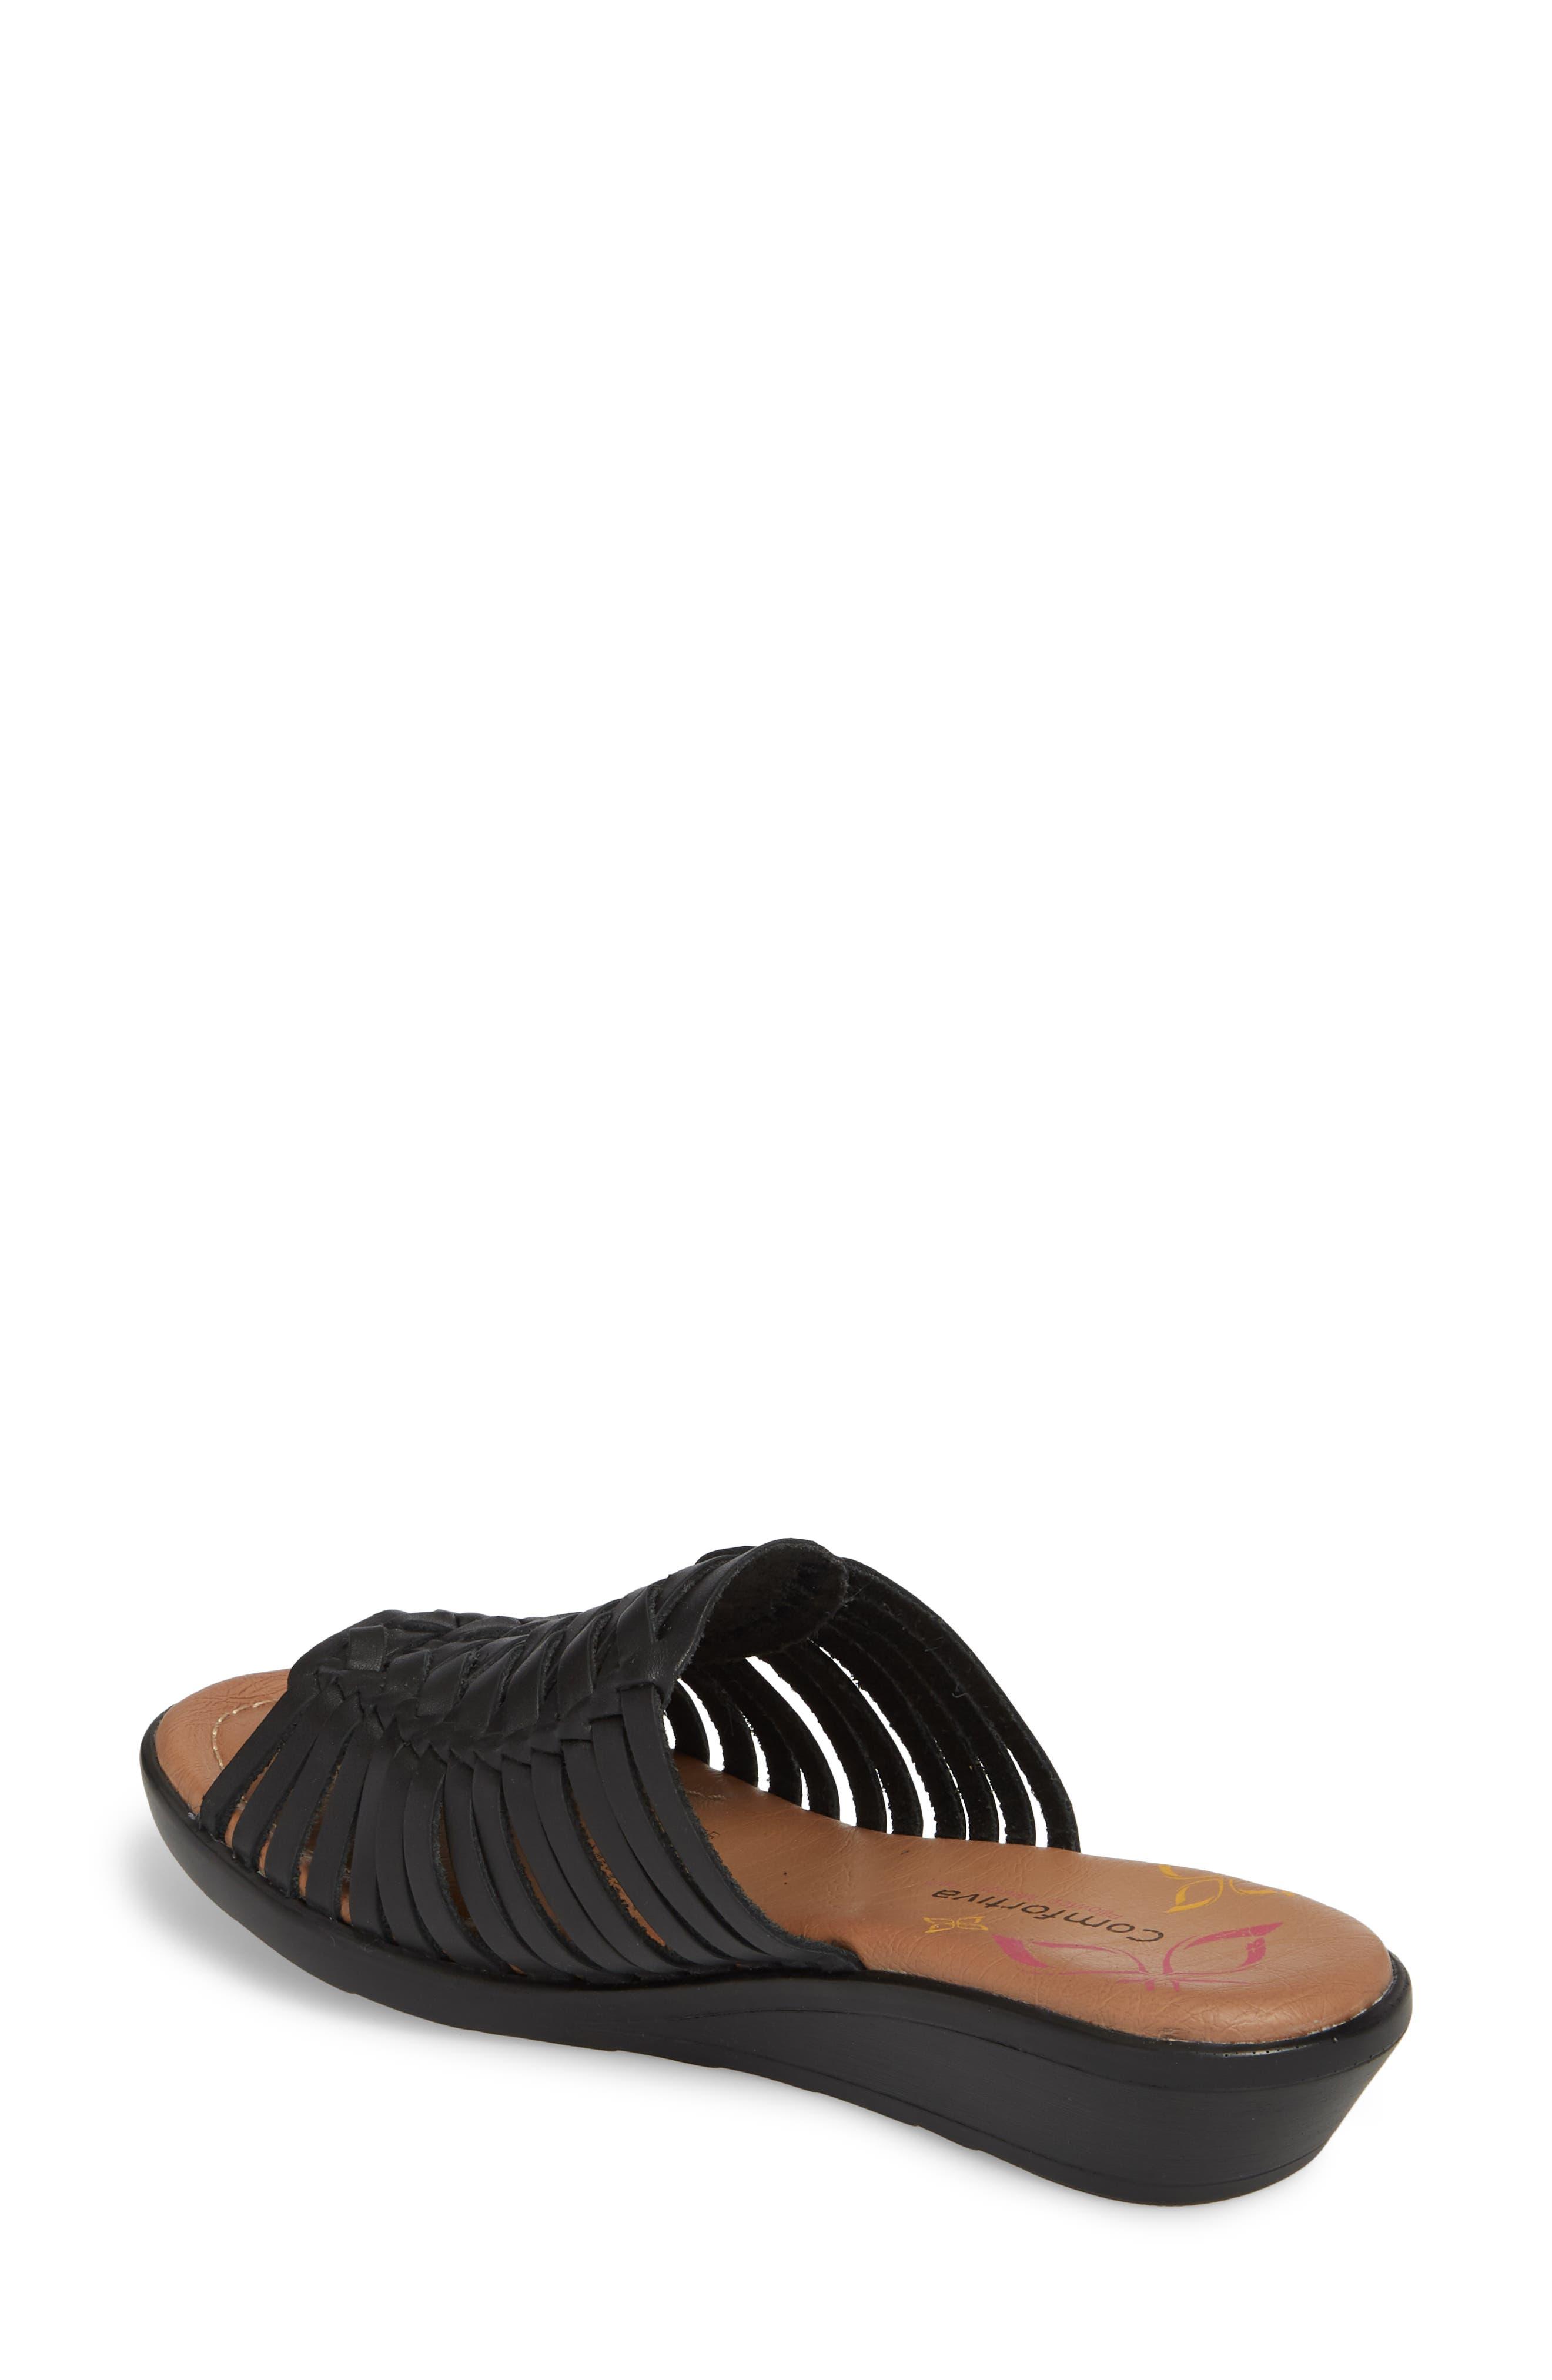 Felida Huarache Slide Sandal,                             Alternate thumbnail 2, color,                             BLACK LEATHER